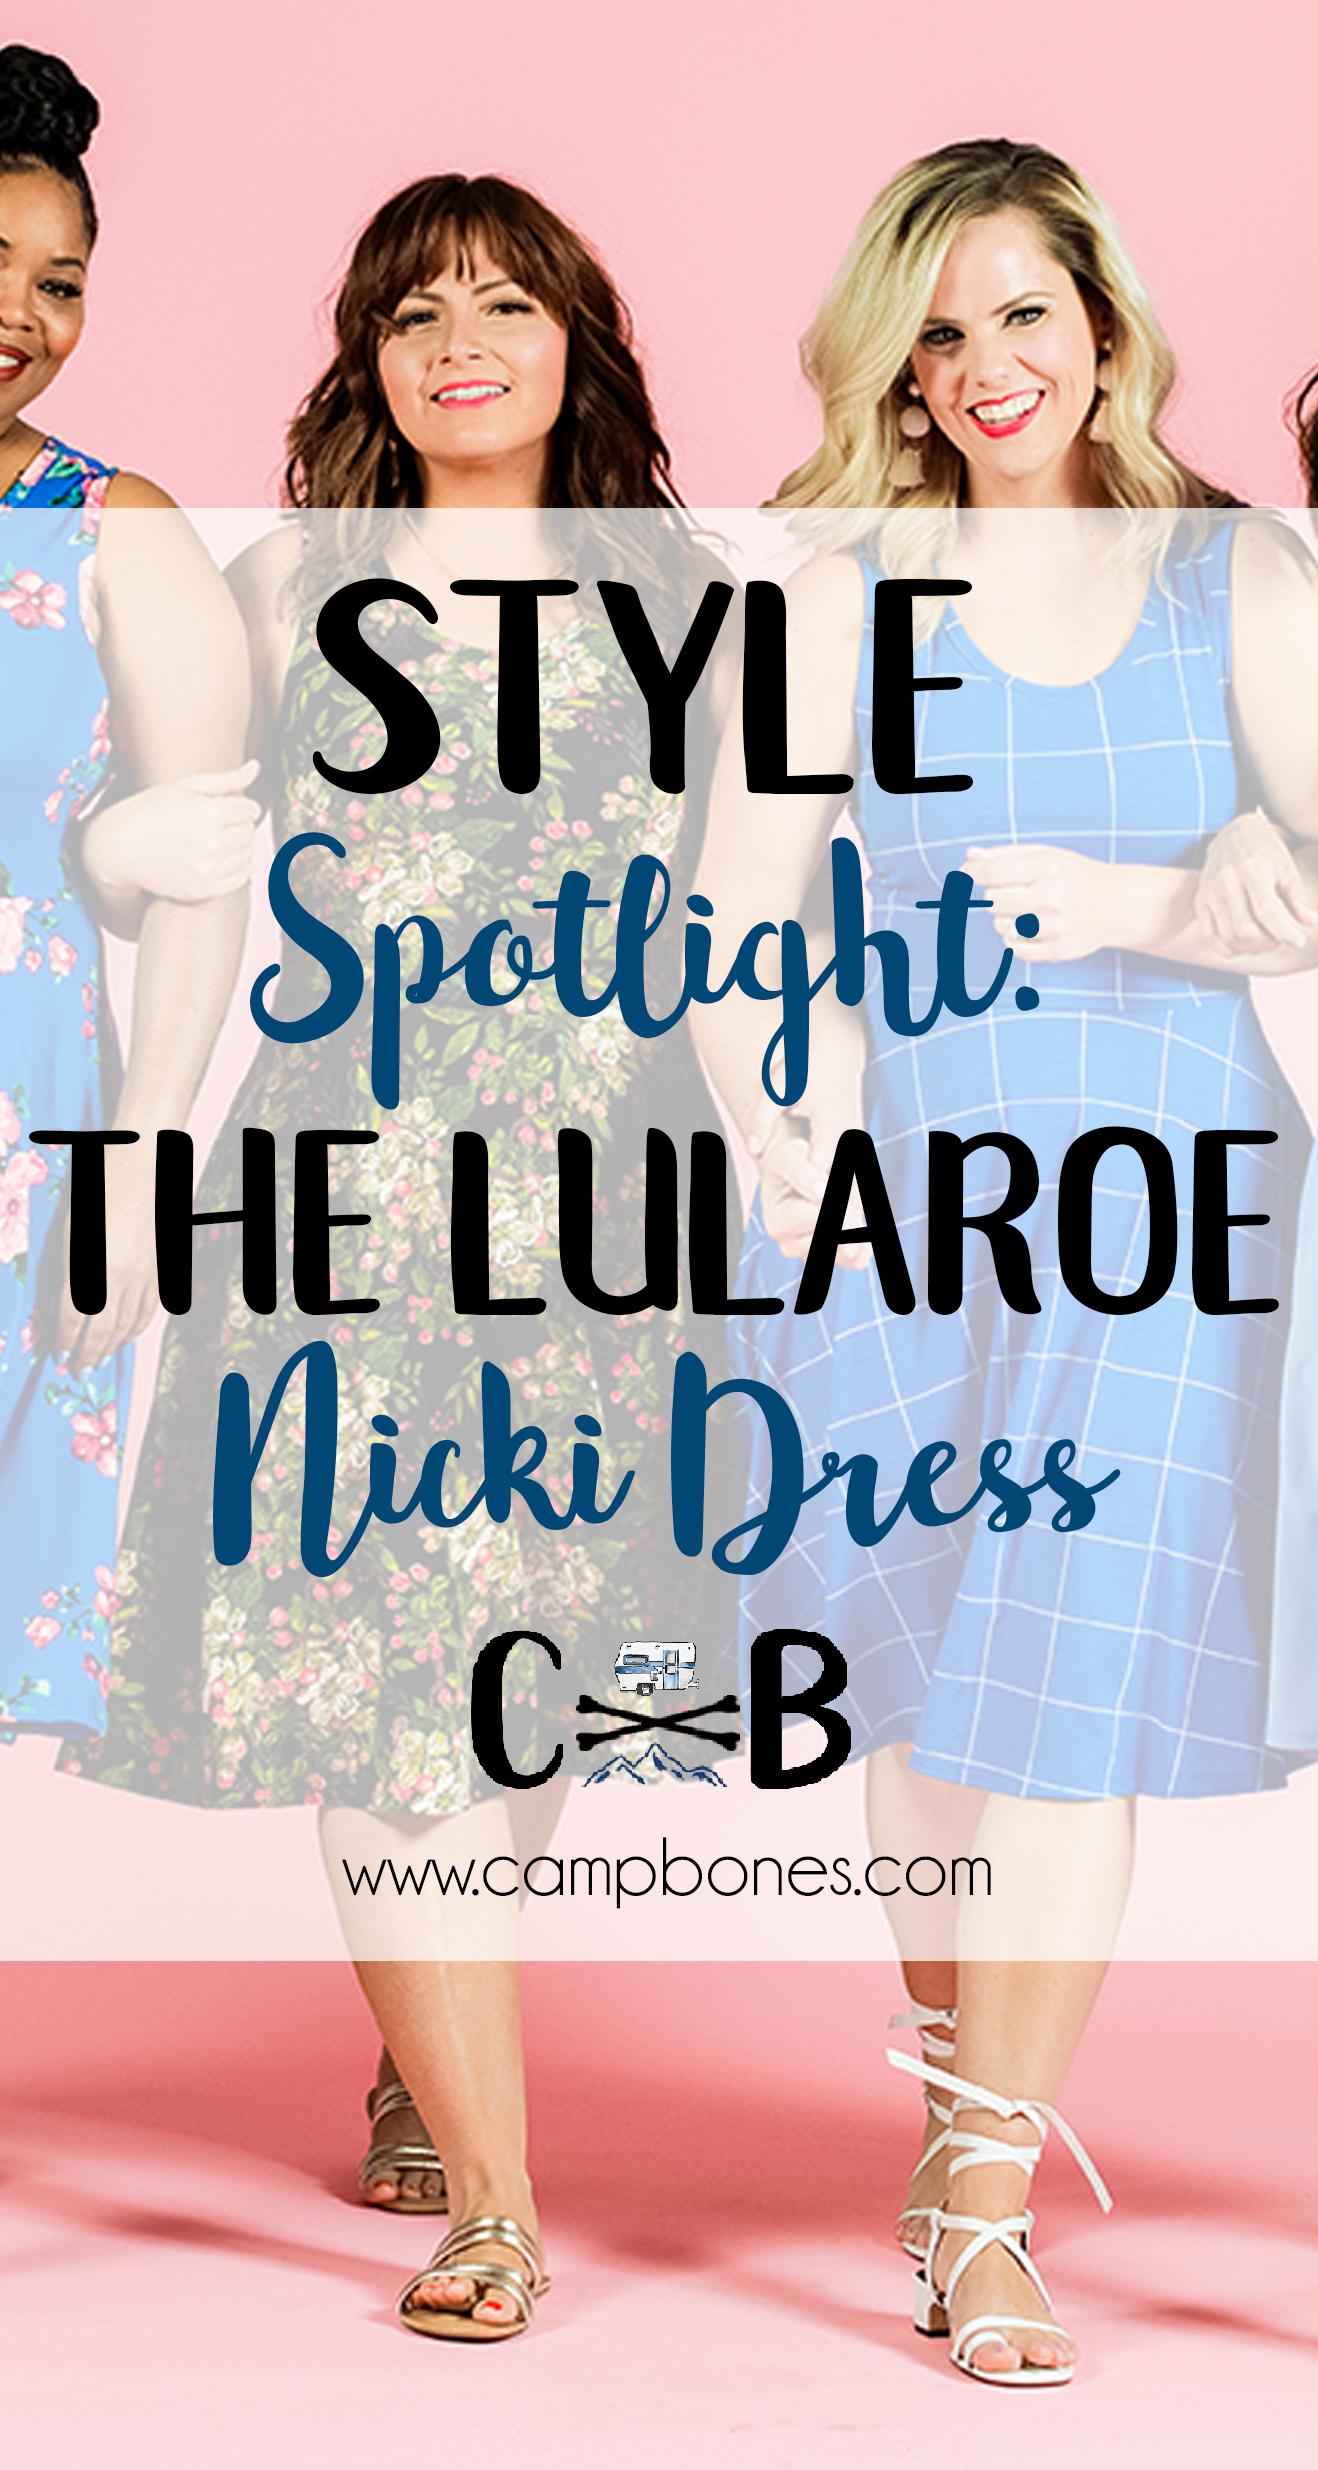 Lularoe Nicki Sizing : lularoe, nicki, sizing, Chart, LuLaRoe, Nicki, Sleeveless, Dress.This, Simple, A-Line, Dress, Go-to, Every, Weathe…, Sleeveless,, Lularoe,, Dresses